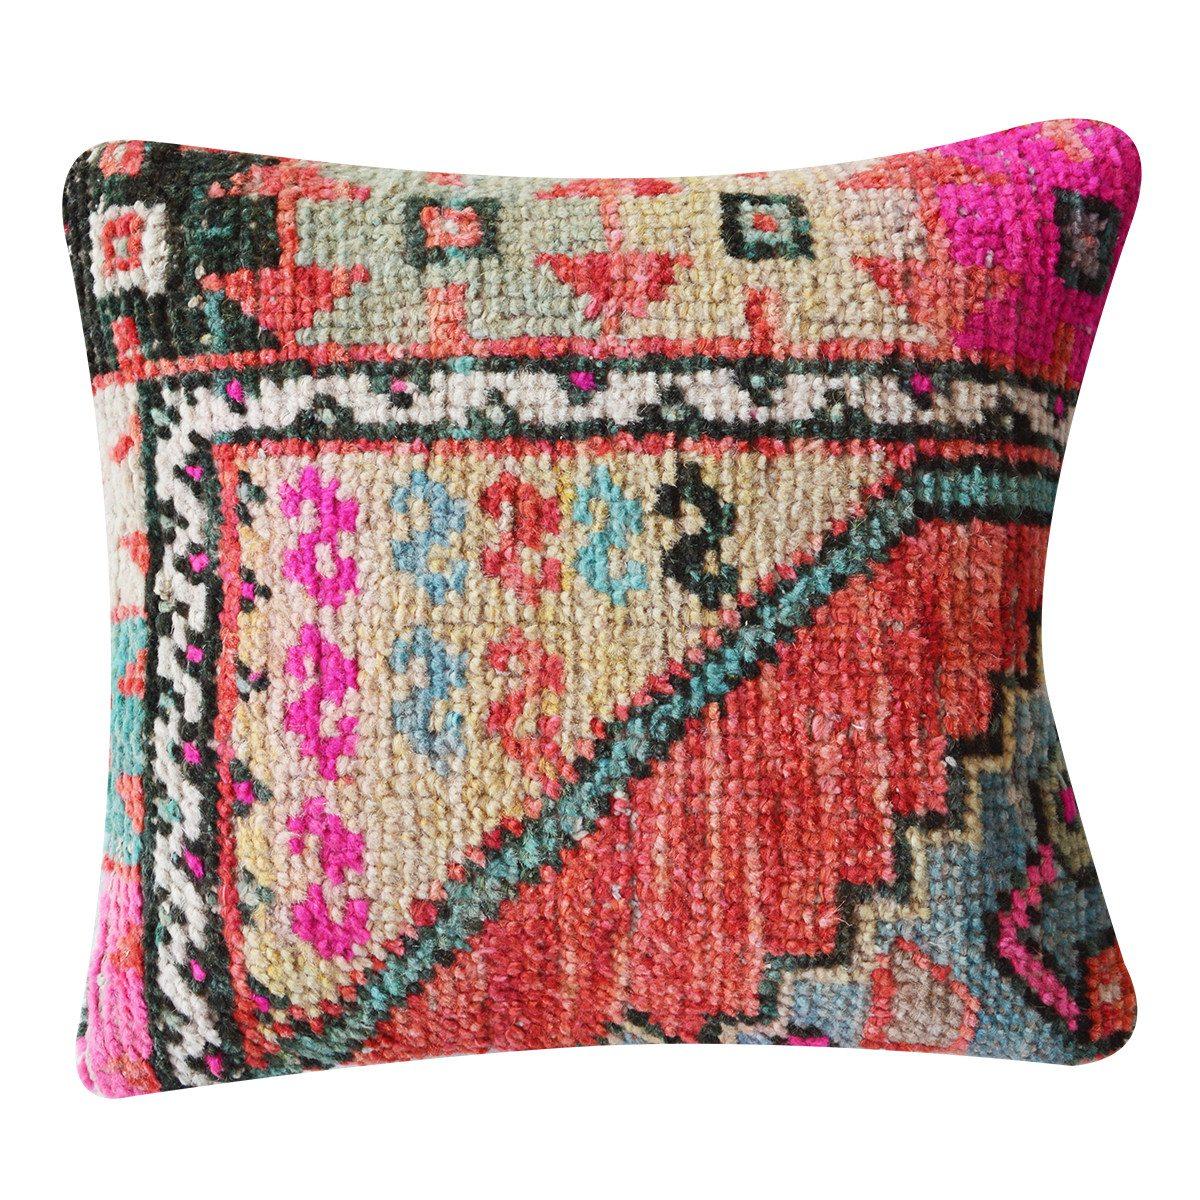 1-pillow-shopceladon